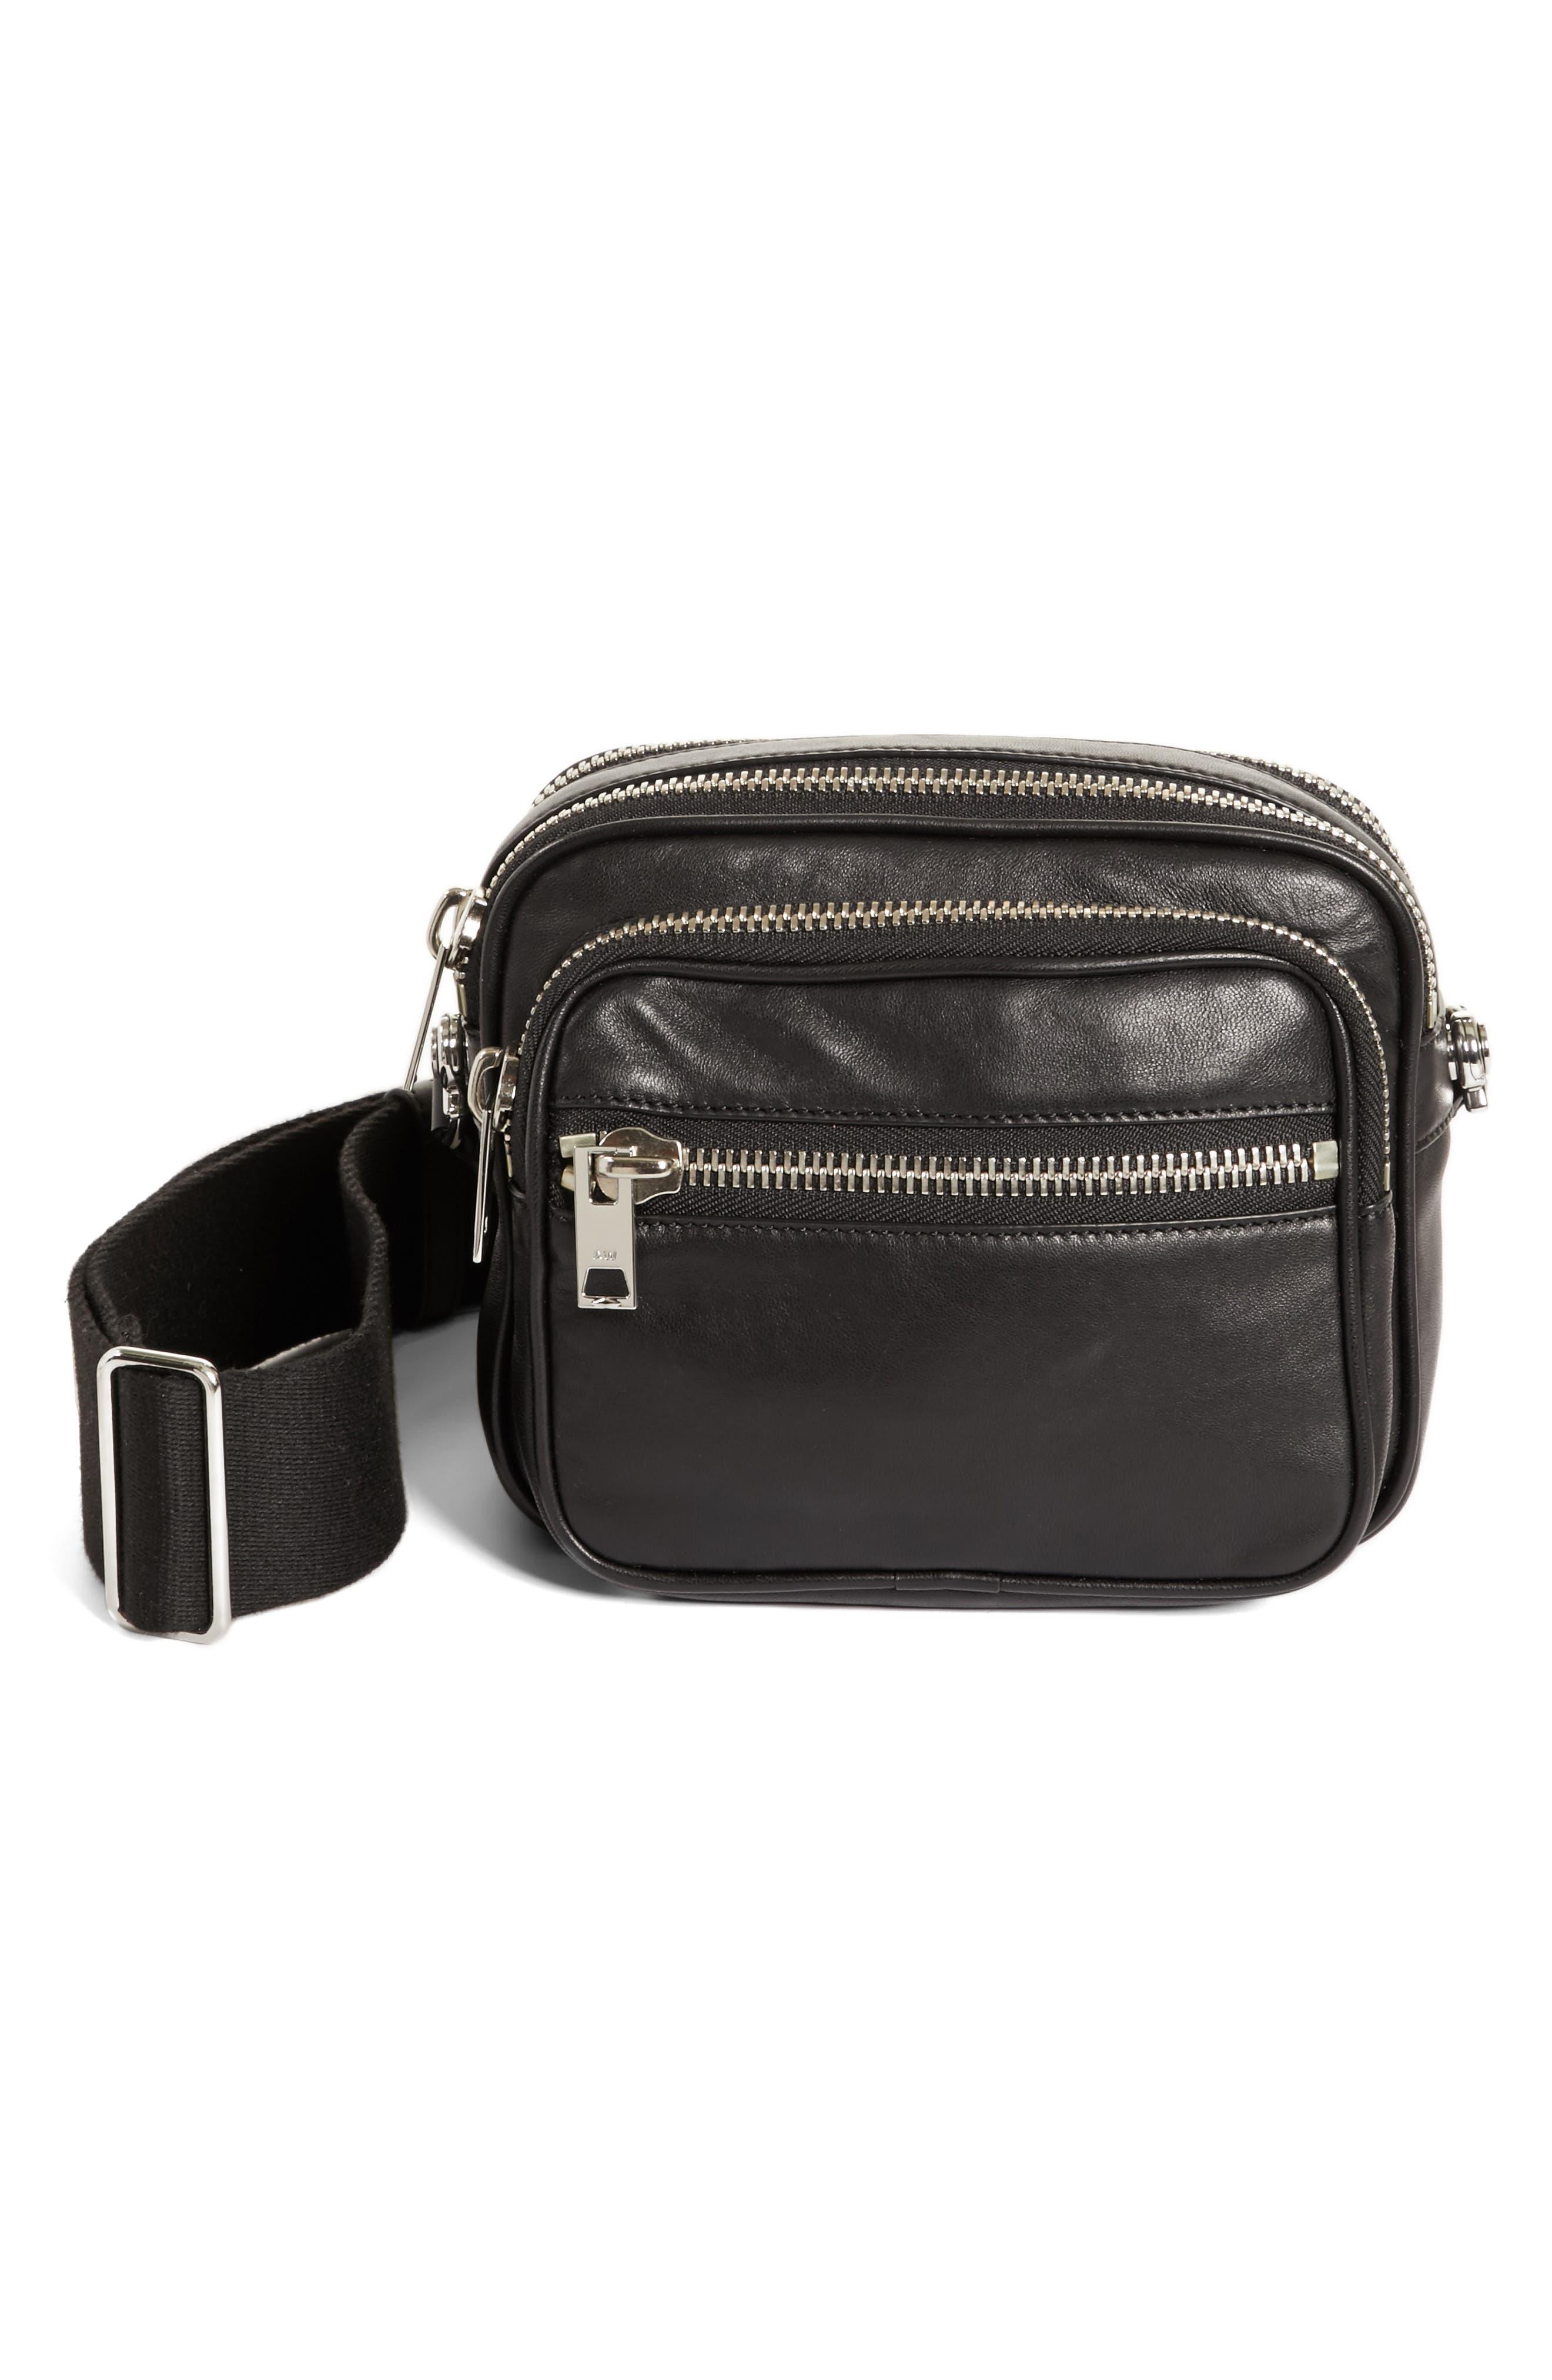 Alexander Wang Large Attica Leather Crossbody Bag